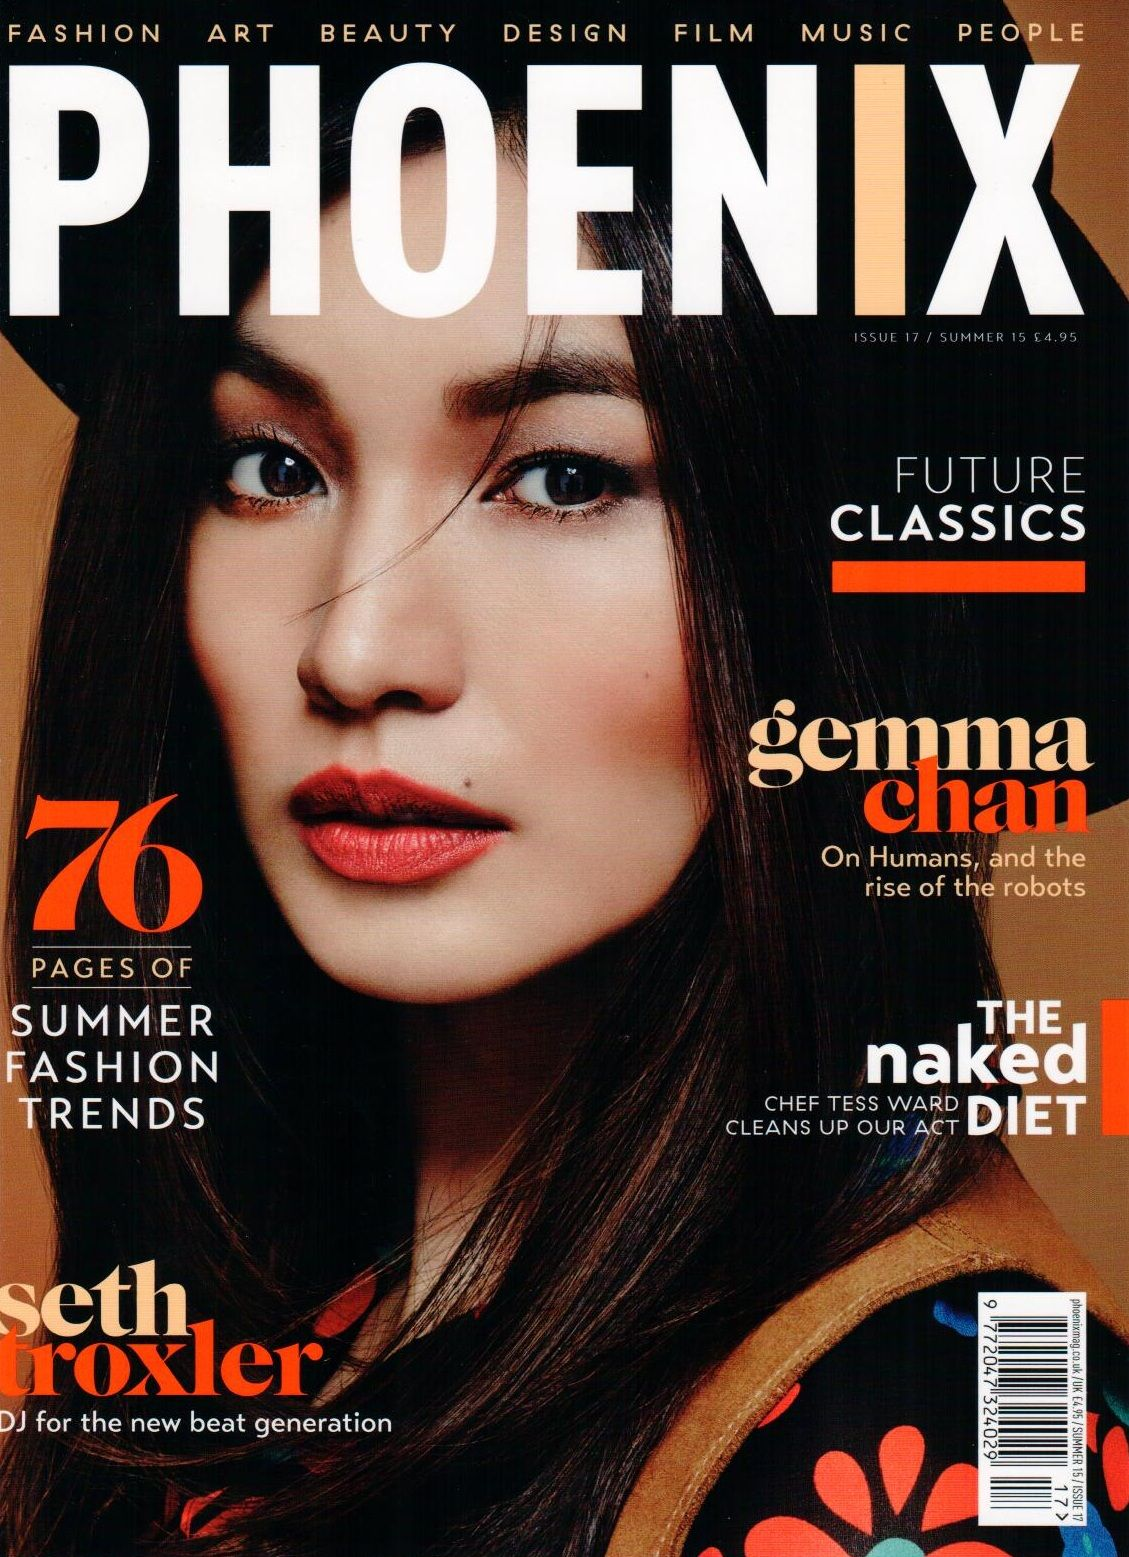 PHOENIX MAGAZINE JULY 2015   PA5H In Phoenix Magazine 'Future Classics' Summer Issue July, 2015.